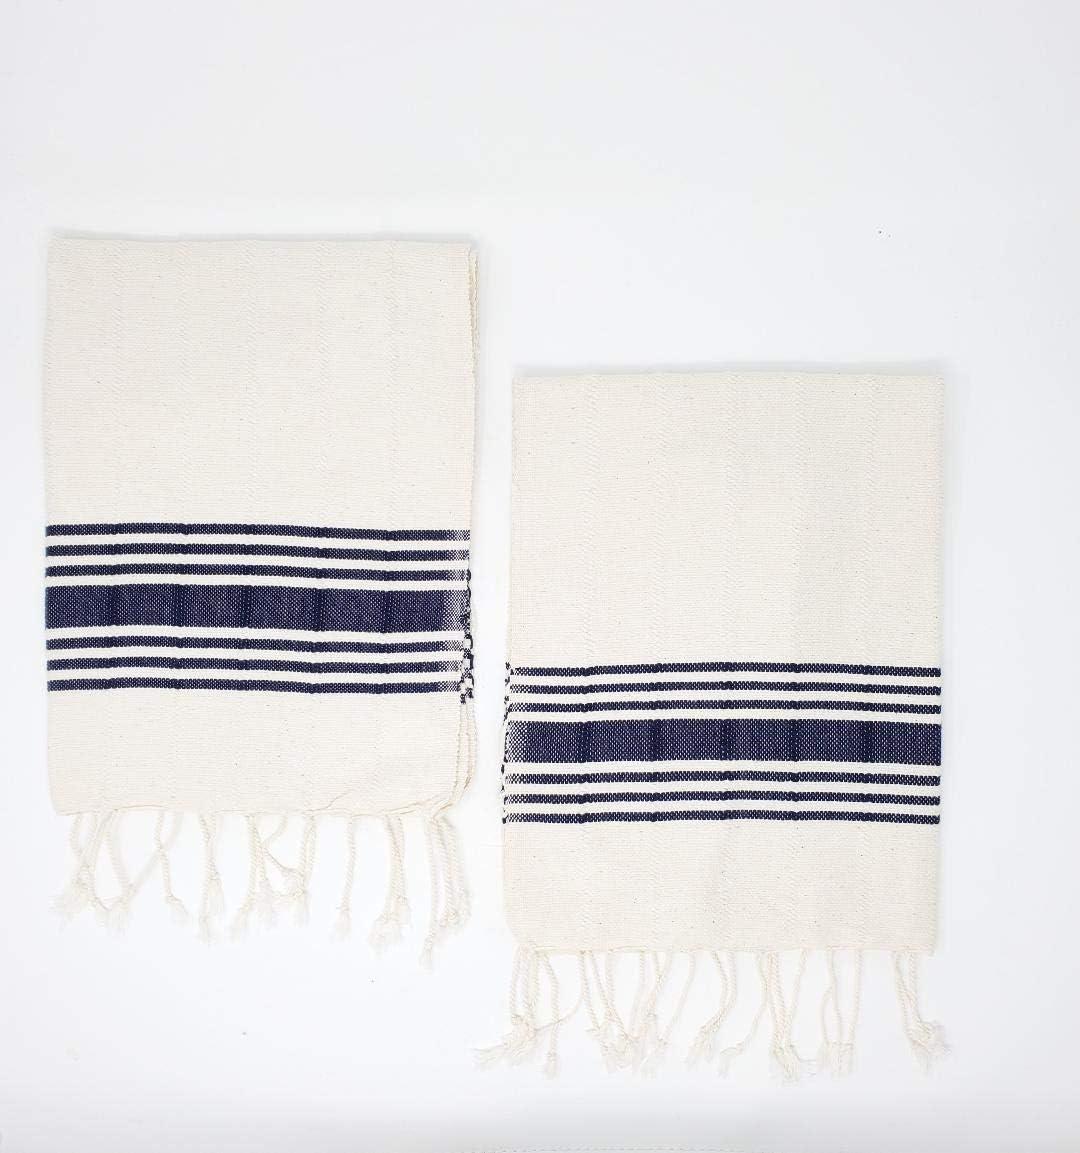 18x40 Turkish Hand Towel,Pink Striped Hand Towel,Turkish Face Towel,Dish Towel,Turkish Towel,Tea Towel,Peshkir,Head Towel,B1-gelinteliH